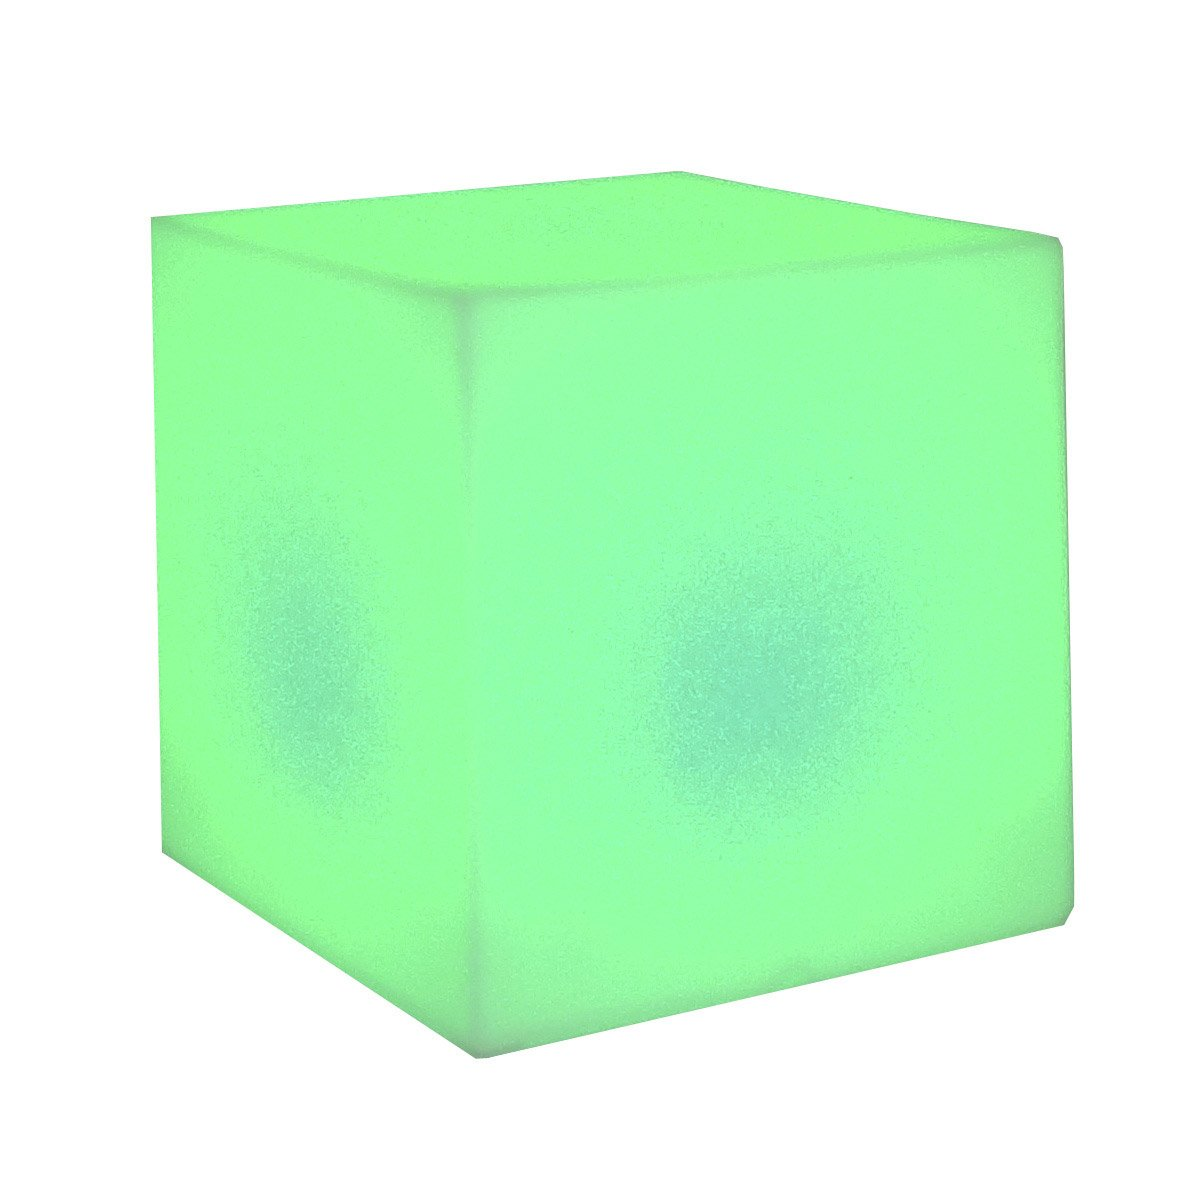 Cuby 20 cube iluminado Outdoor batería recargable LED RGB waterproof 20x20x20cm